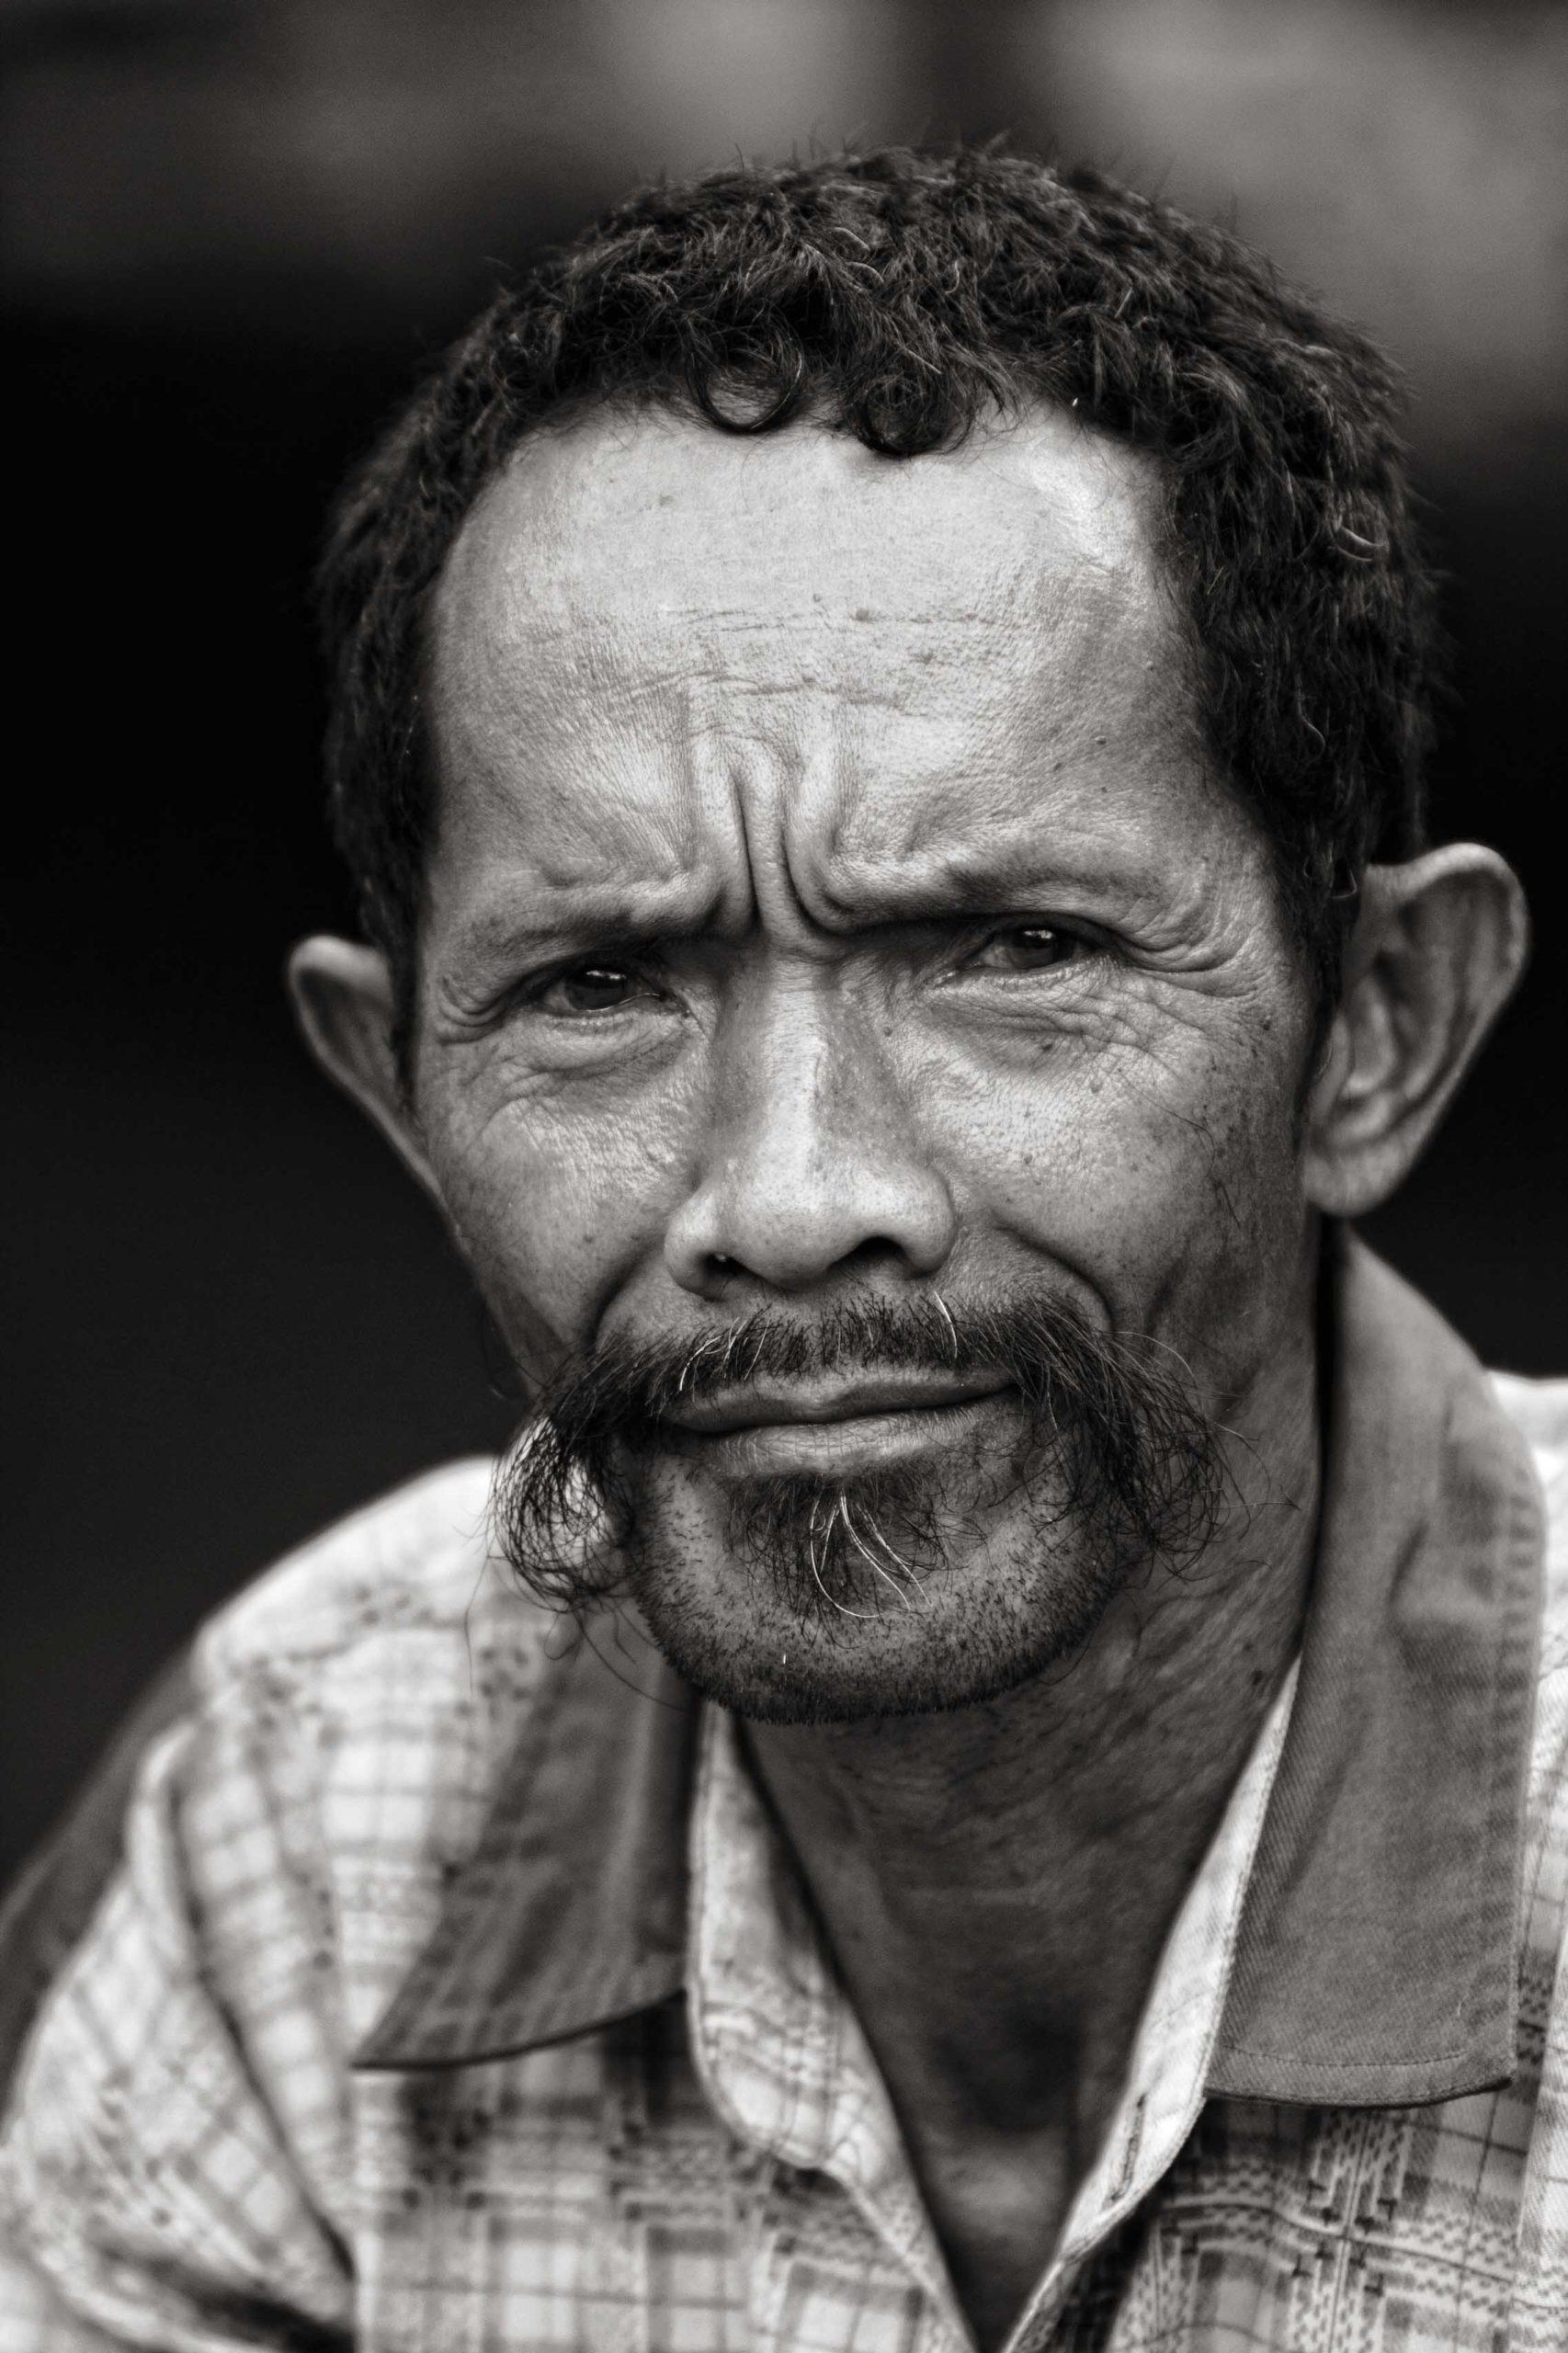 Indonesian Visage 32